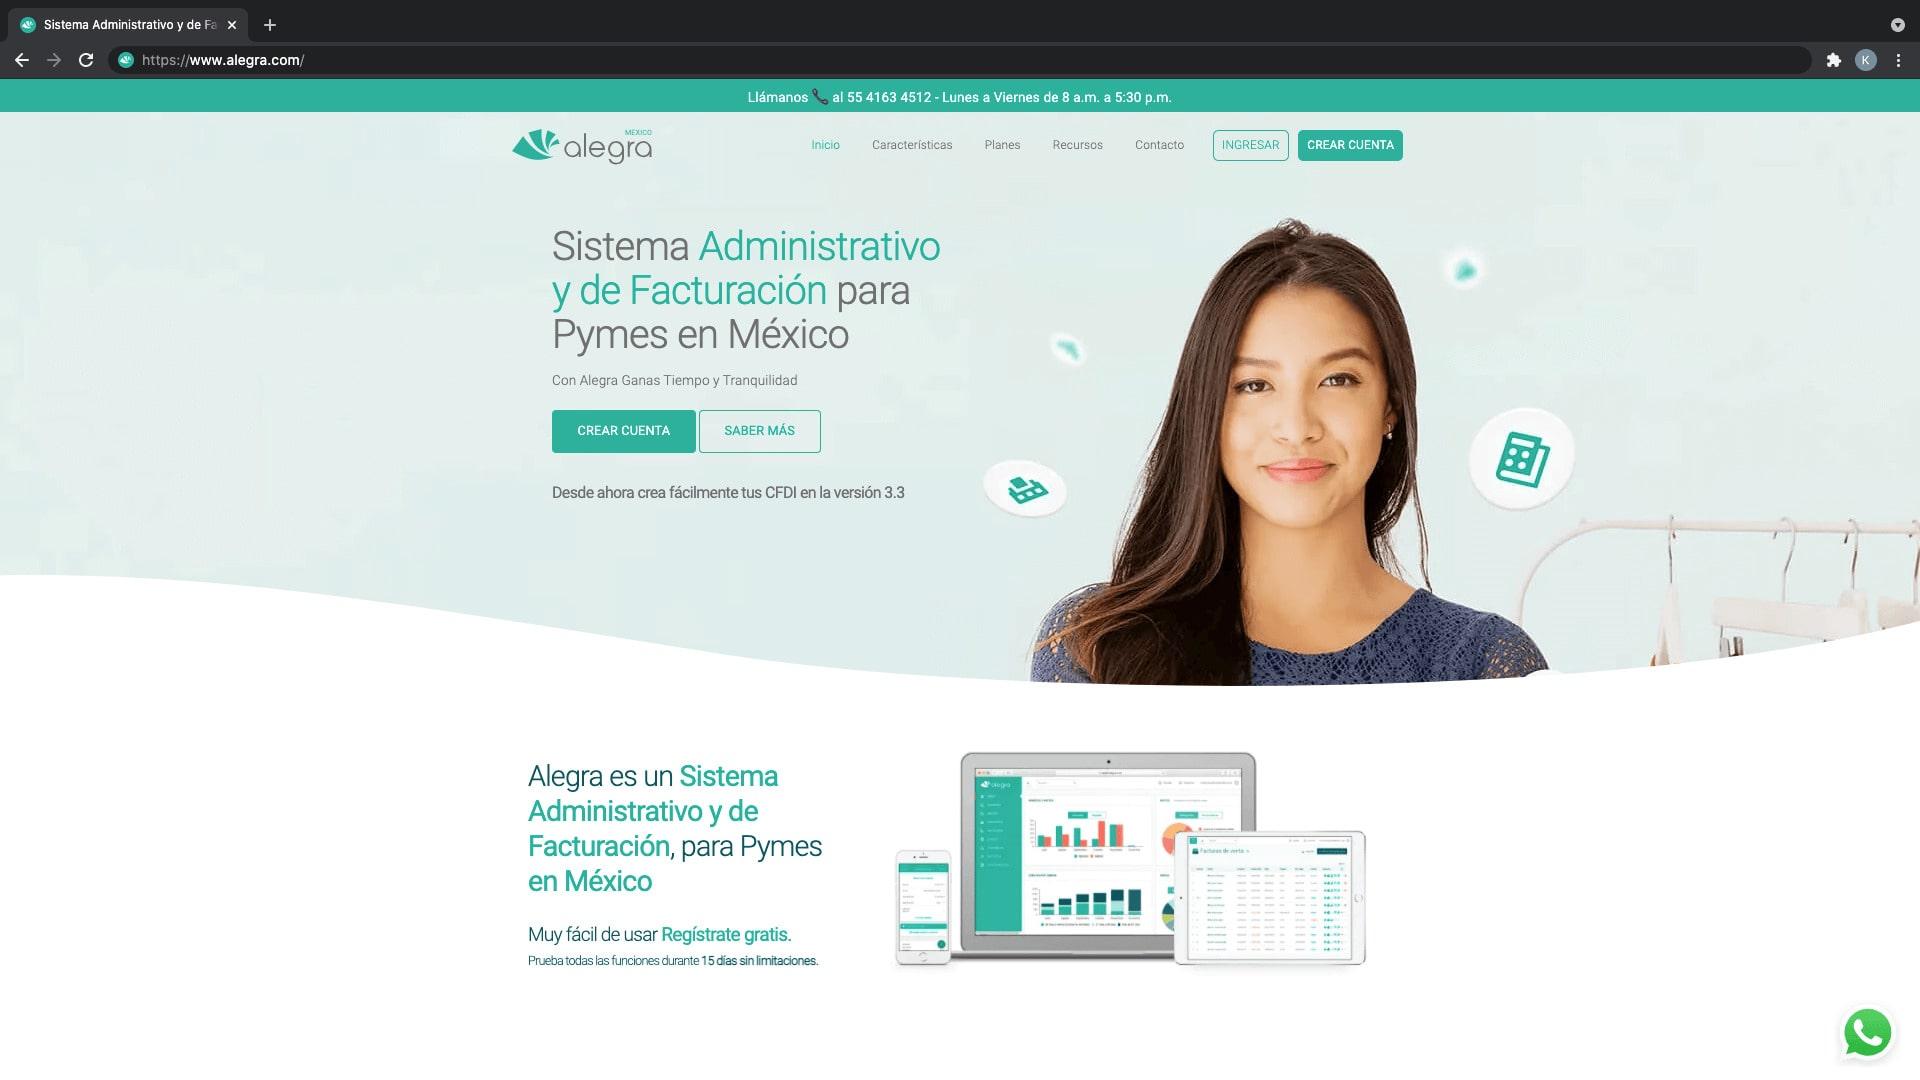 Alegra, plataforma de facturación en línea